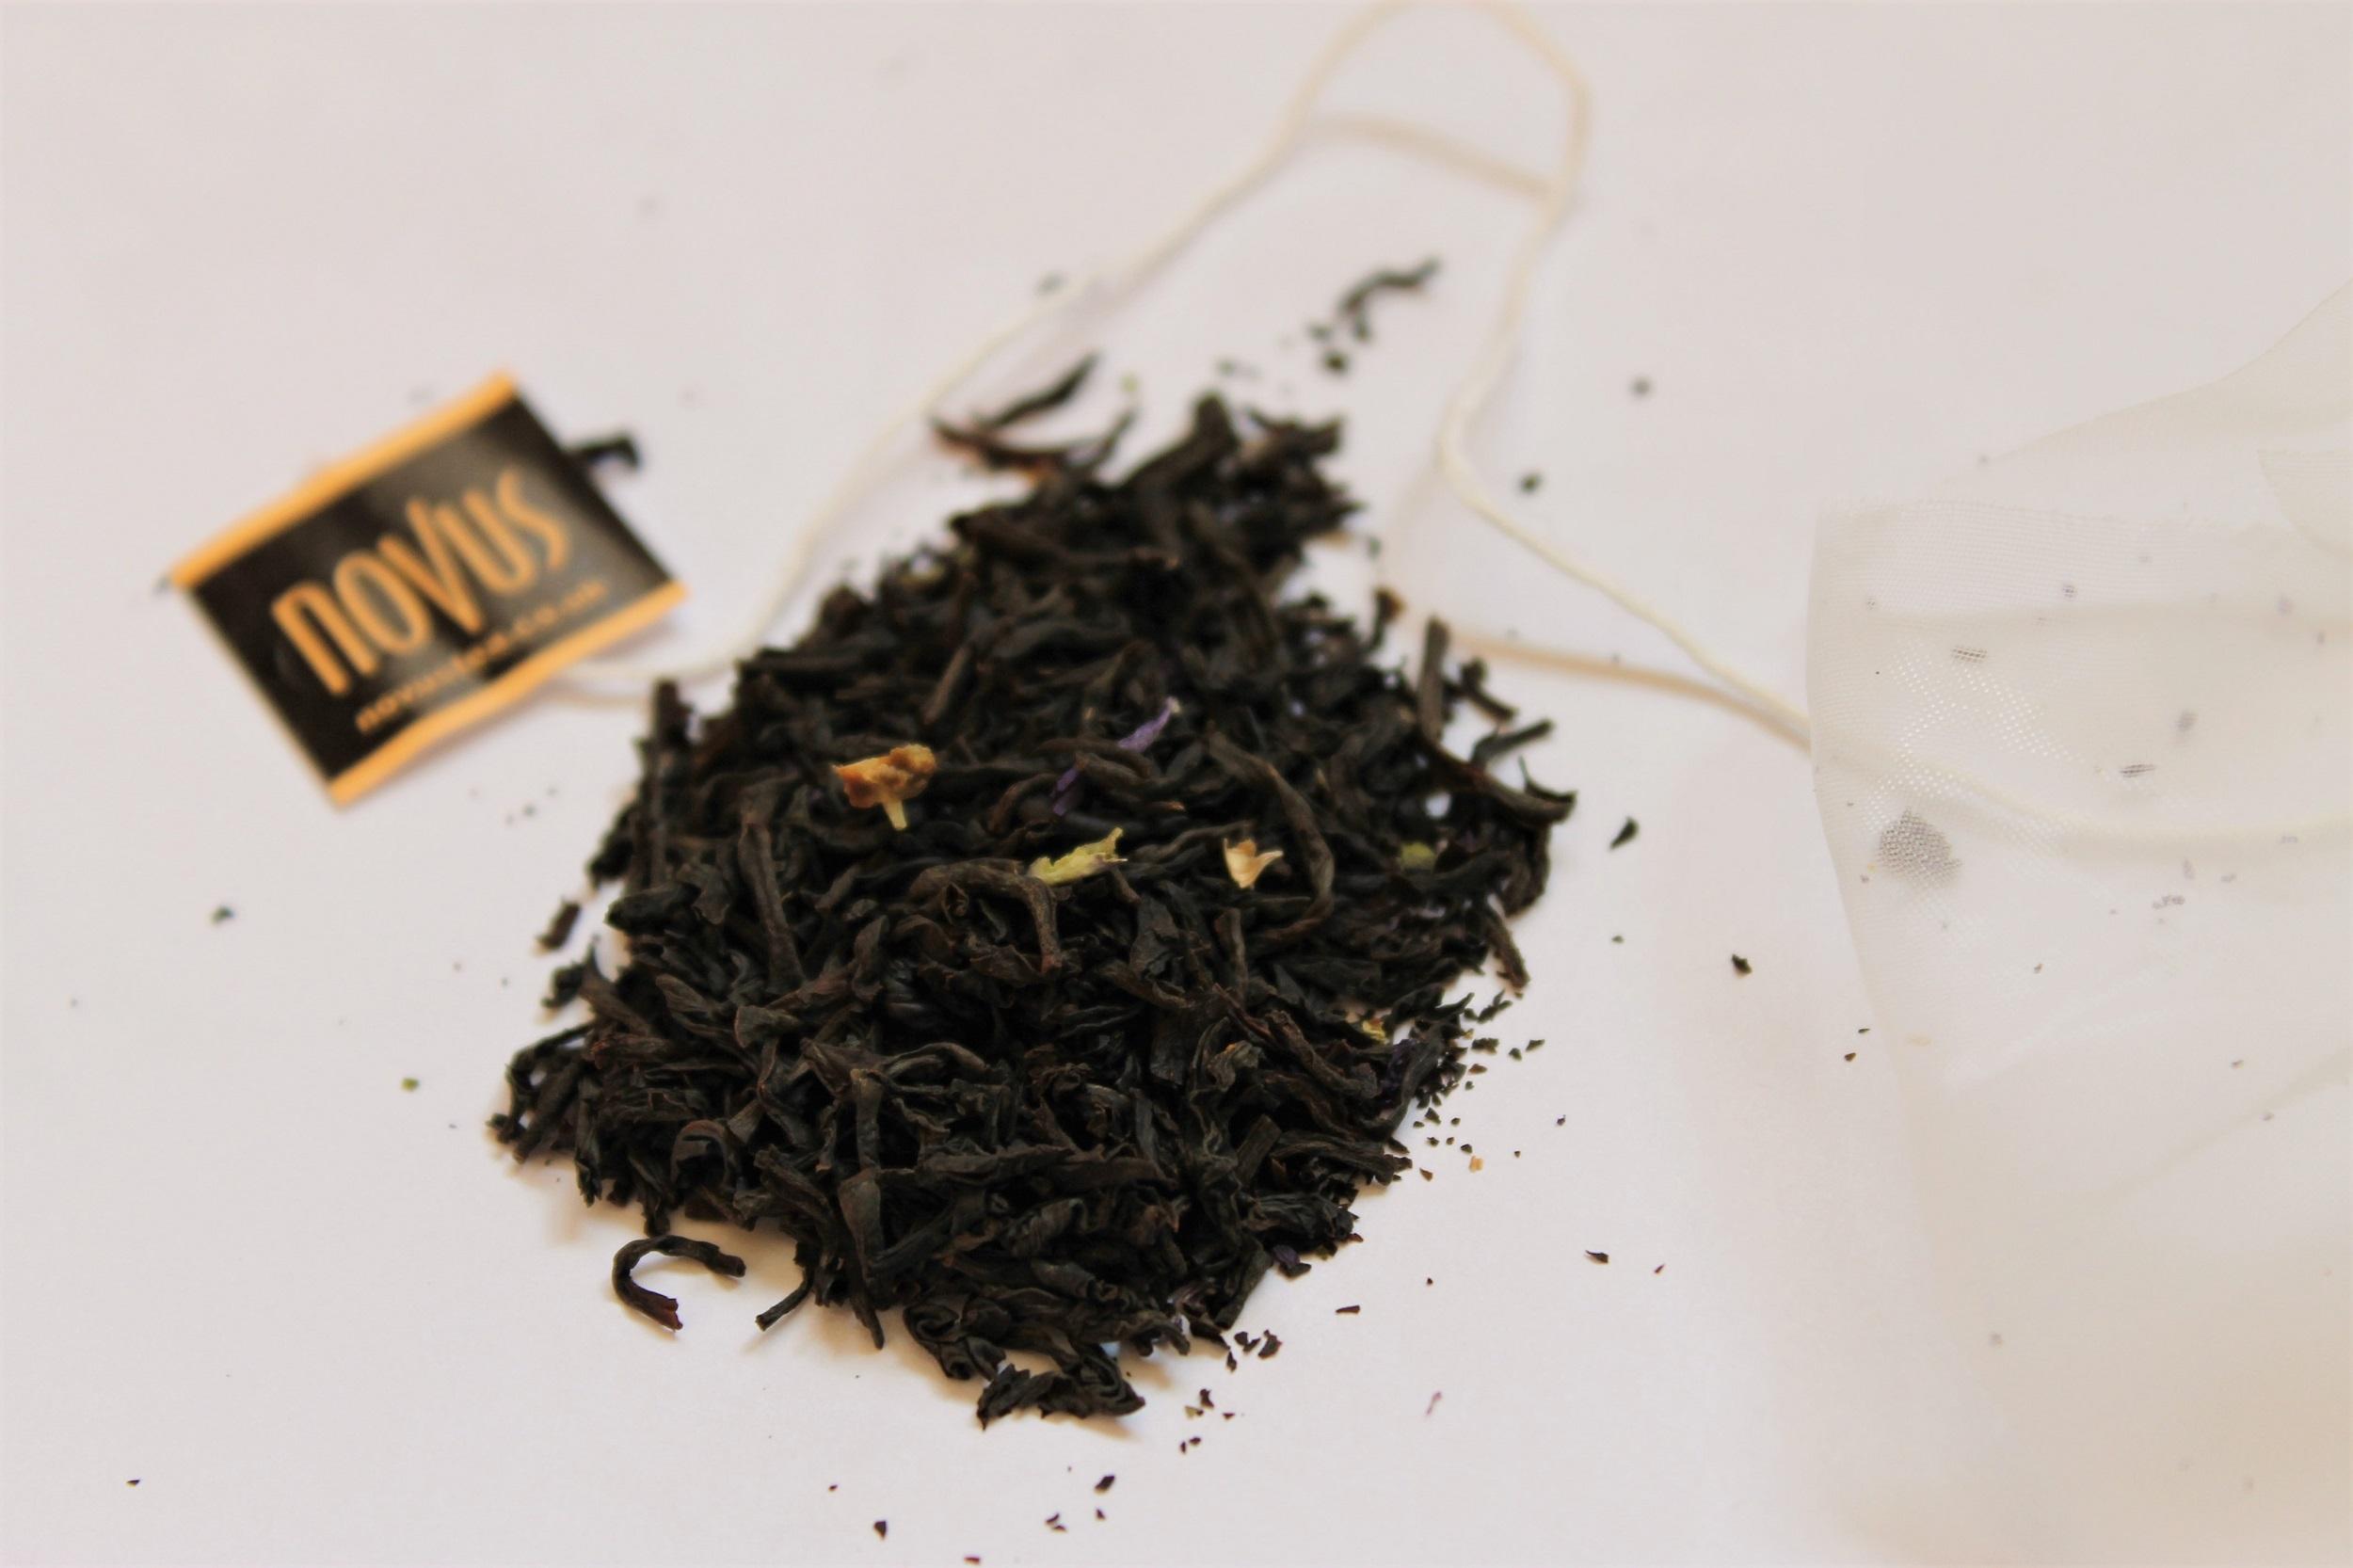 ceylon black tea with bergamot and malva flowers